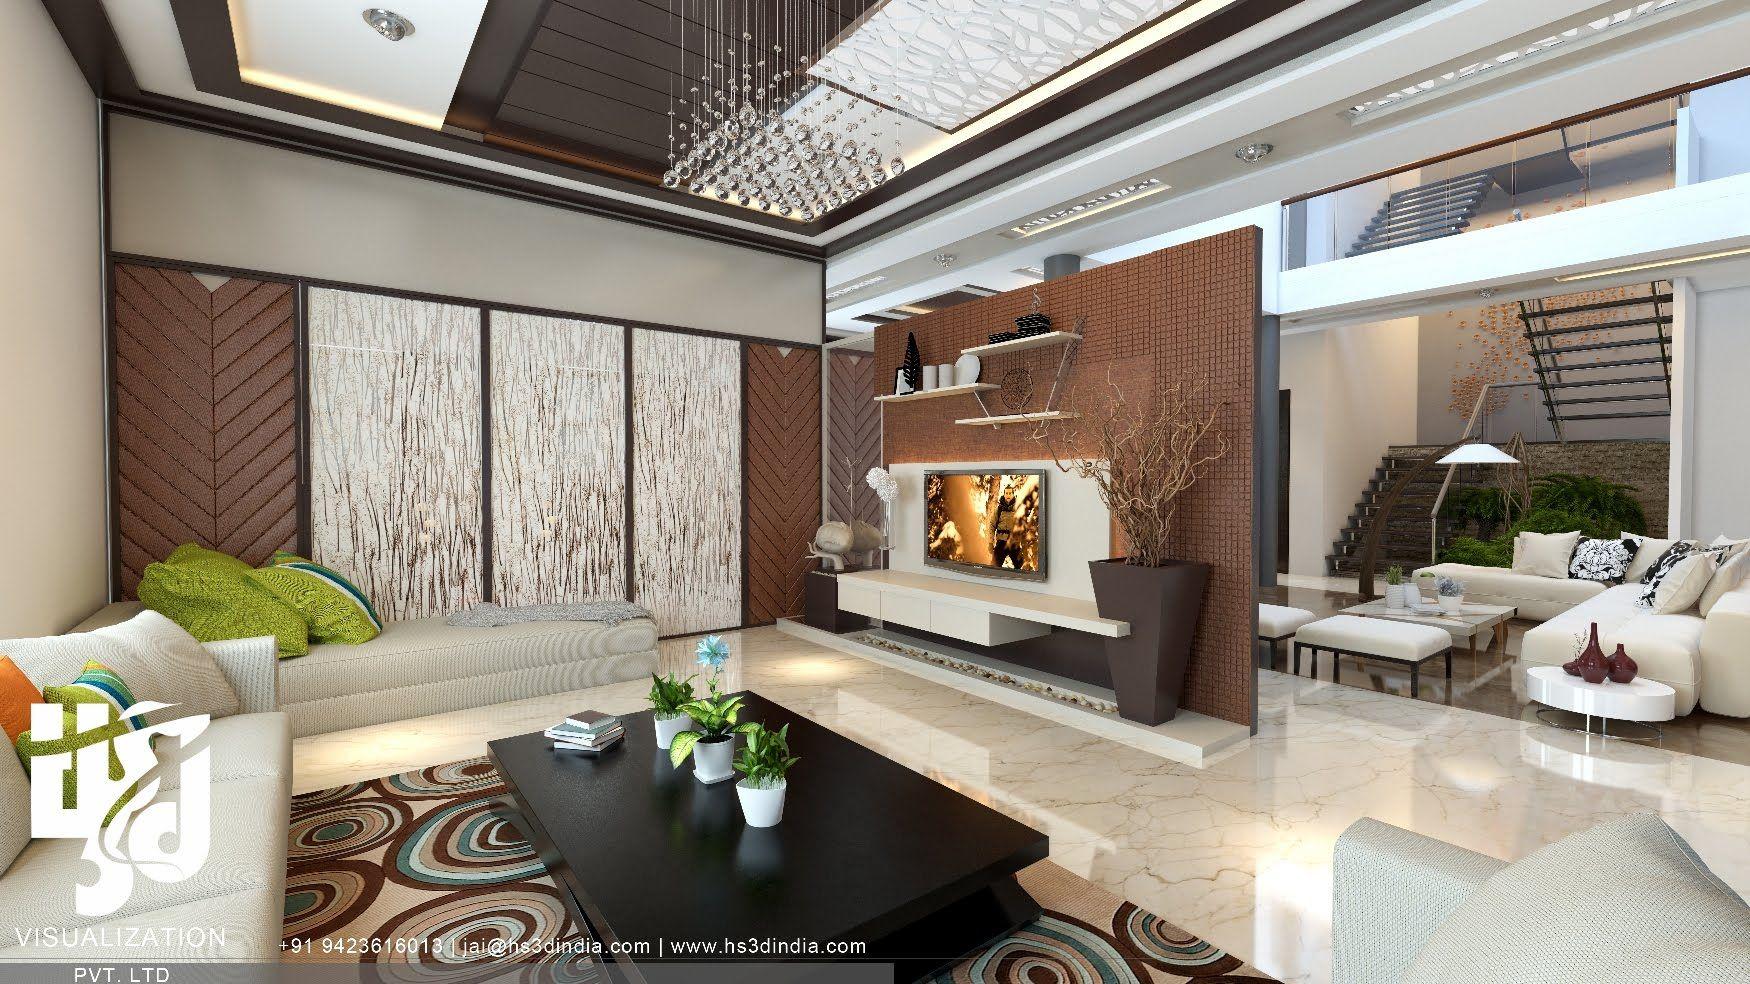 Luxurious Villa 3d Interior Walkthrough Animation By Hs 3d India